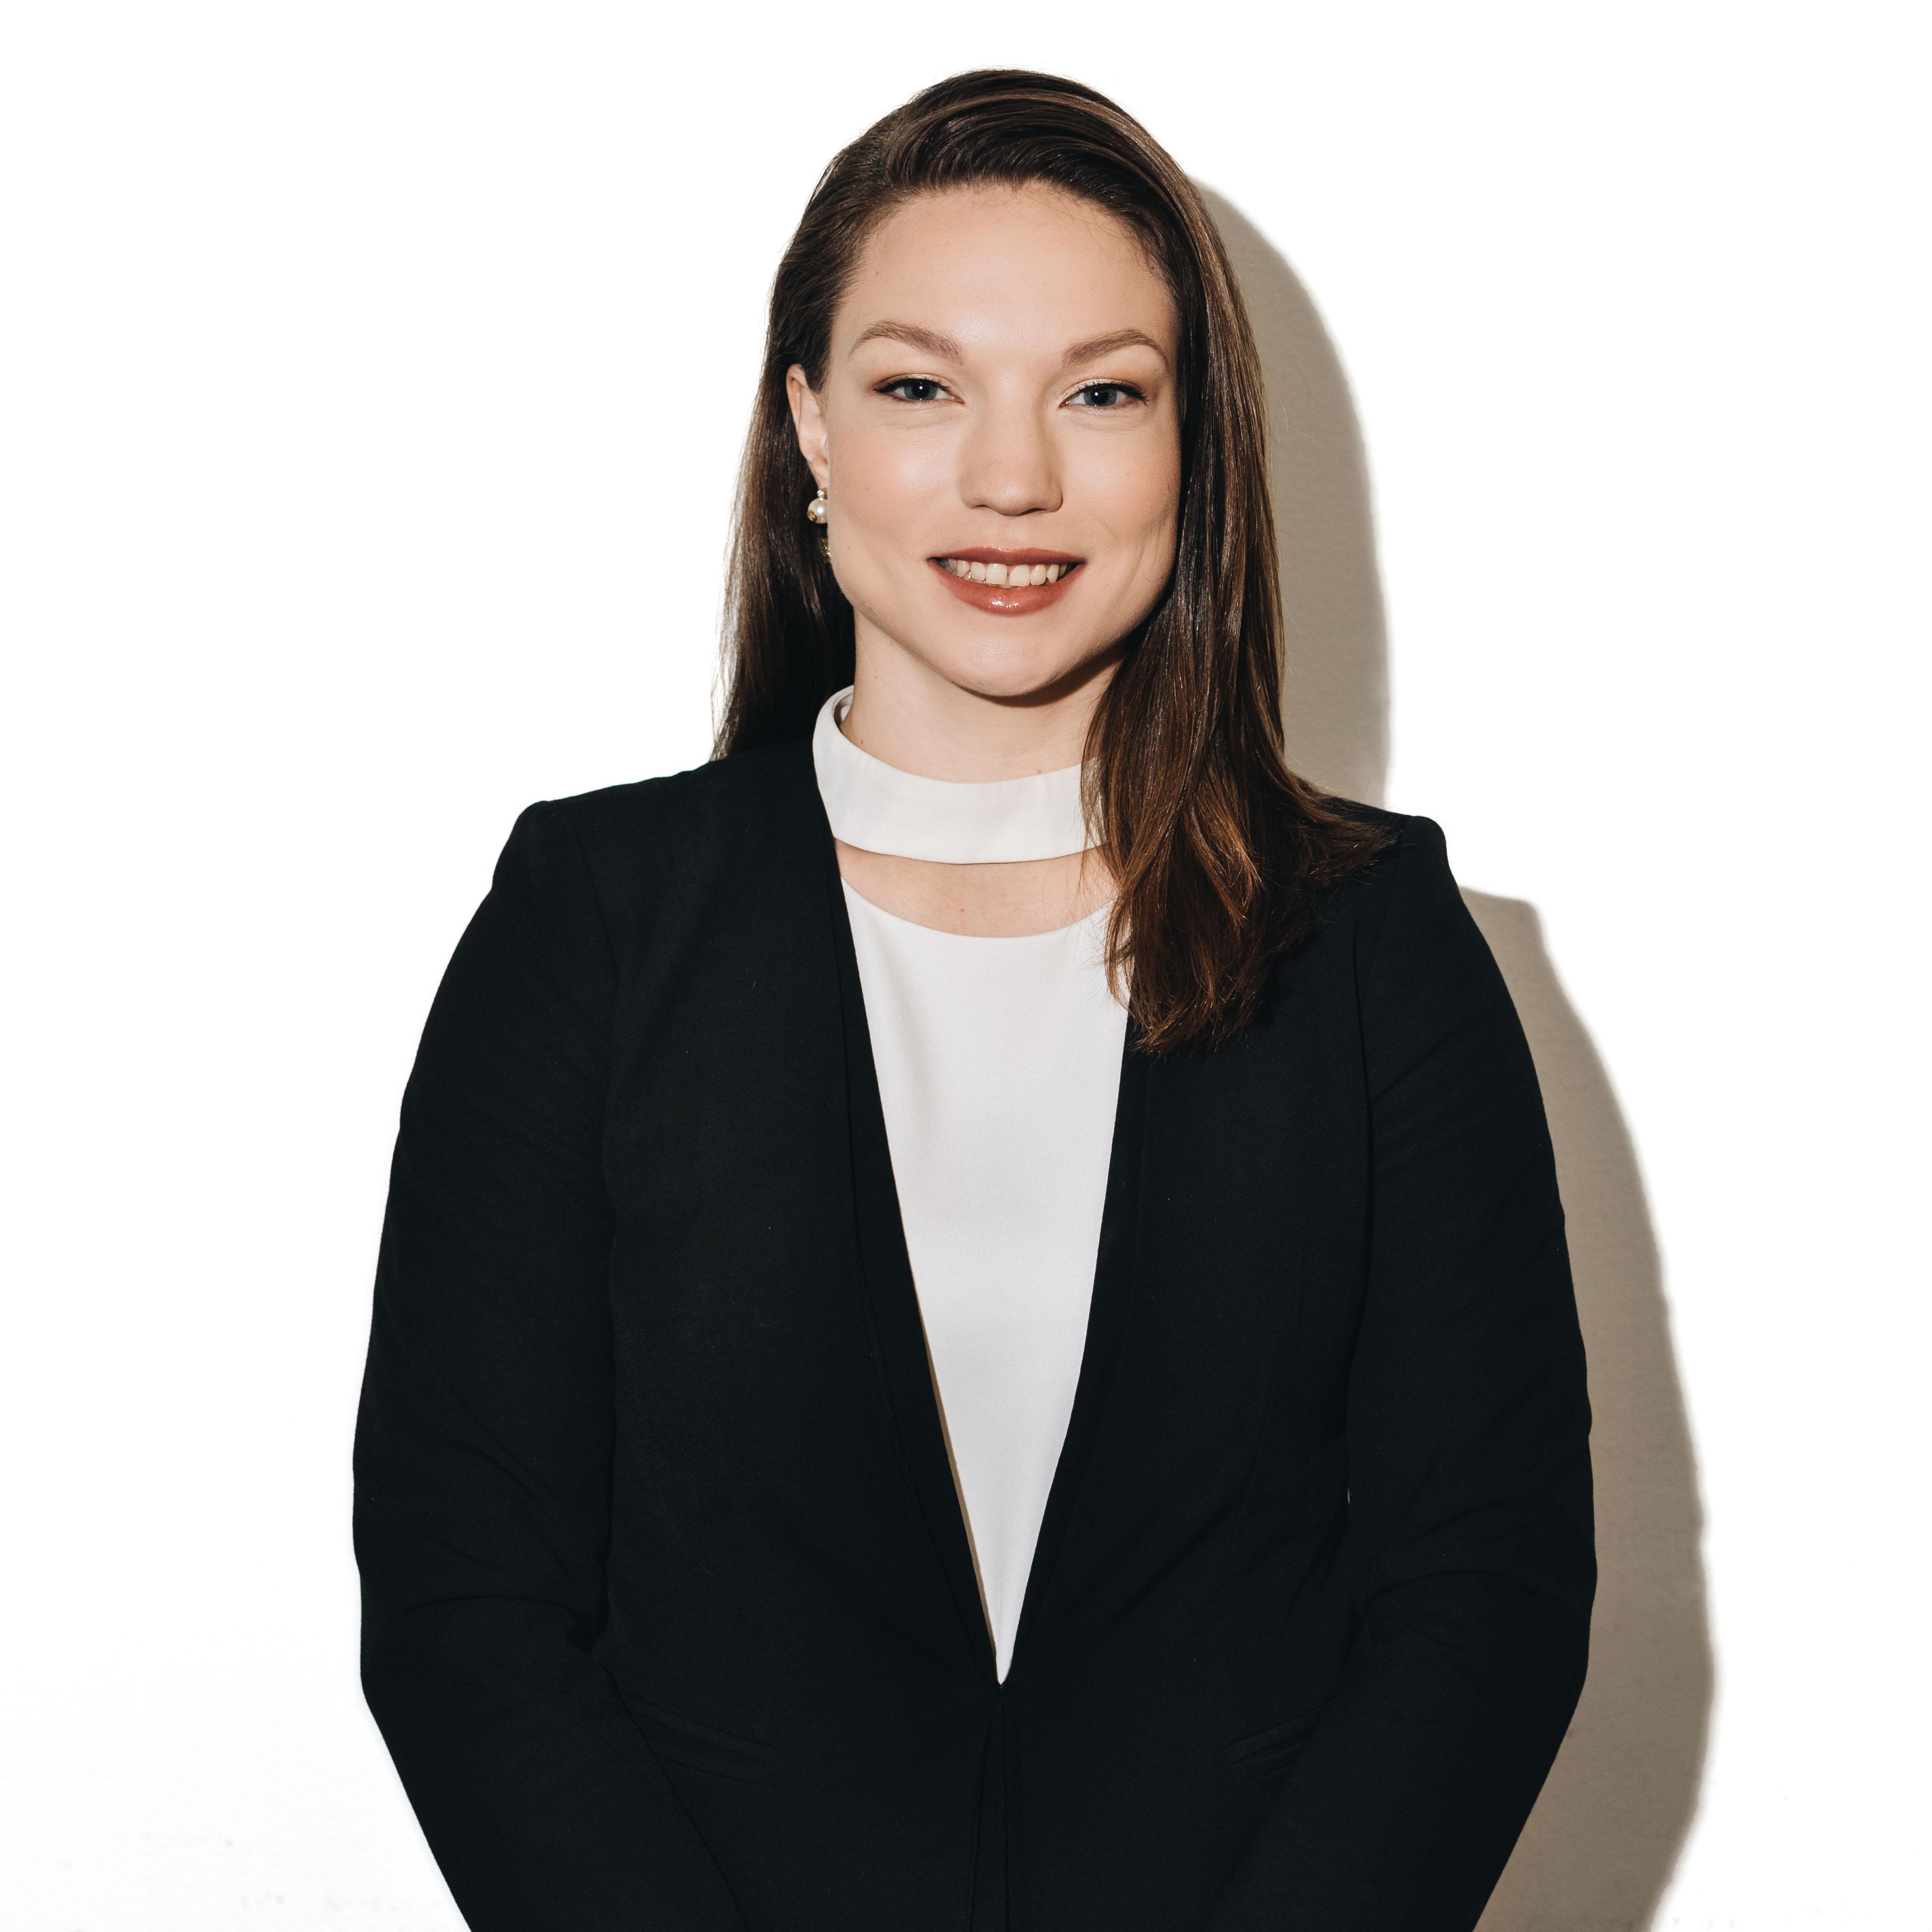 Caitlin Trevino